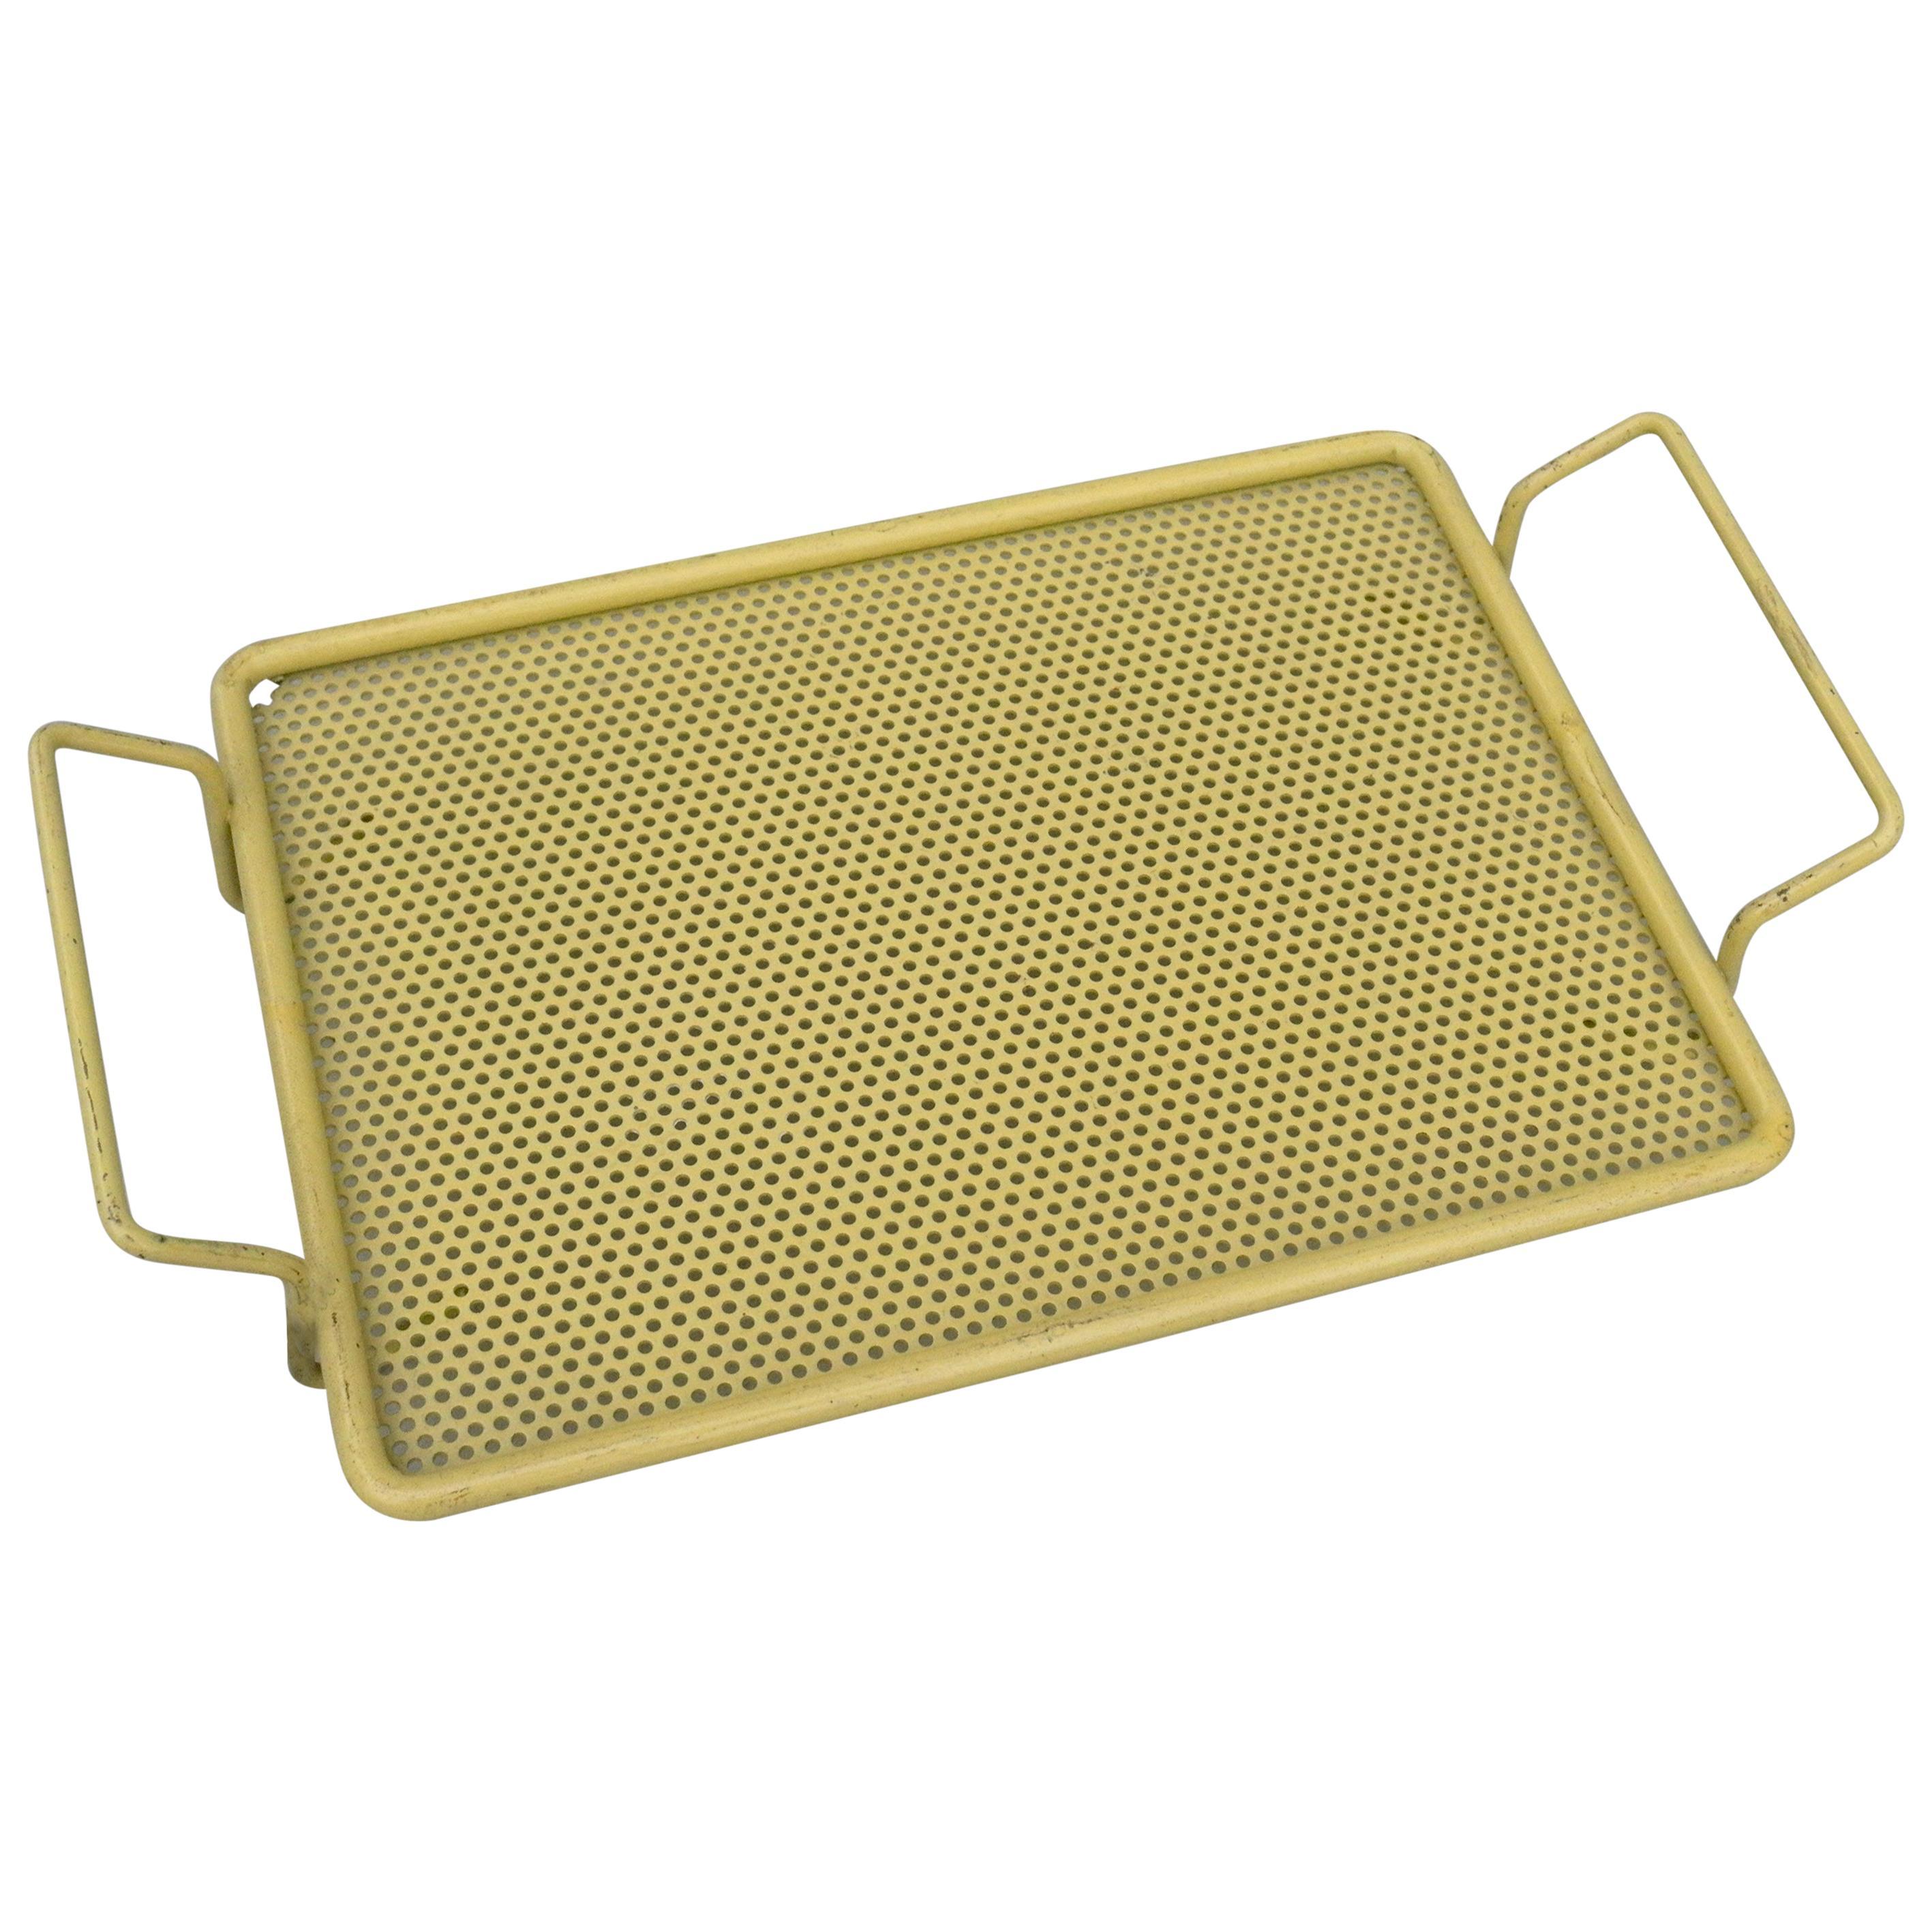 NOS Mathieu Matégot Metal Yellow Bonbonniere Mini serving tray France 1950's